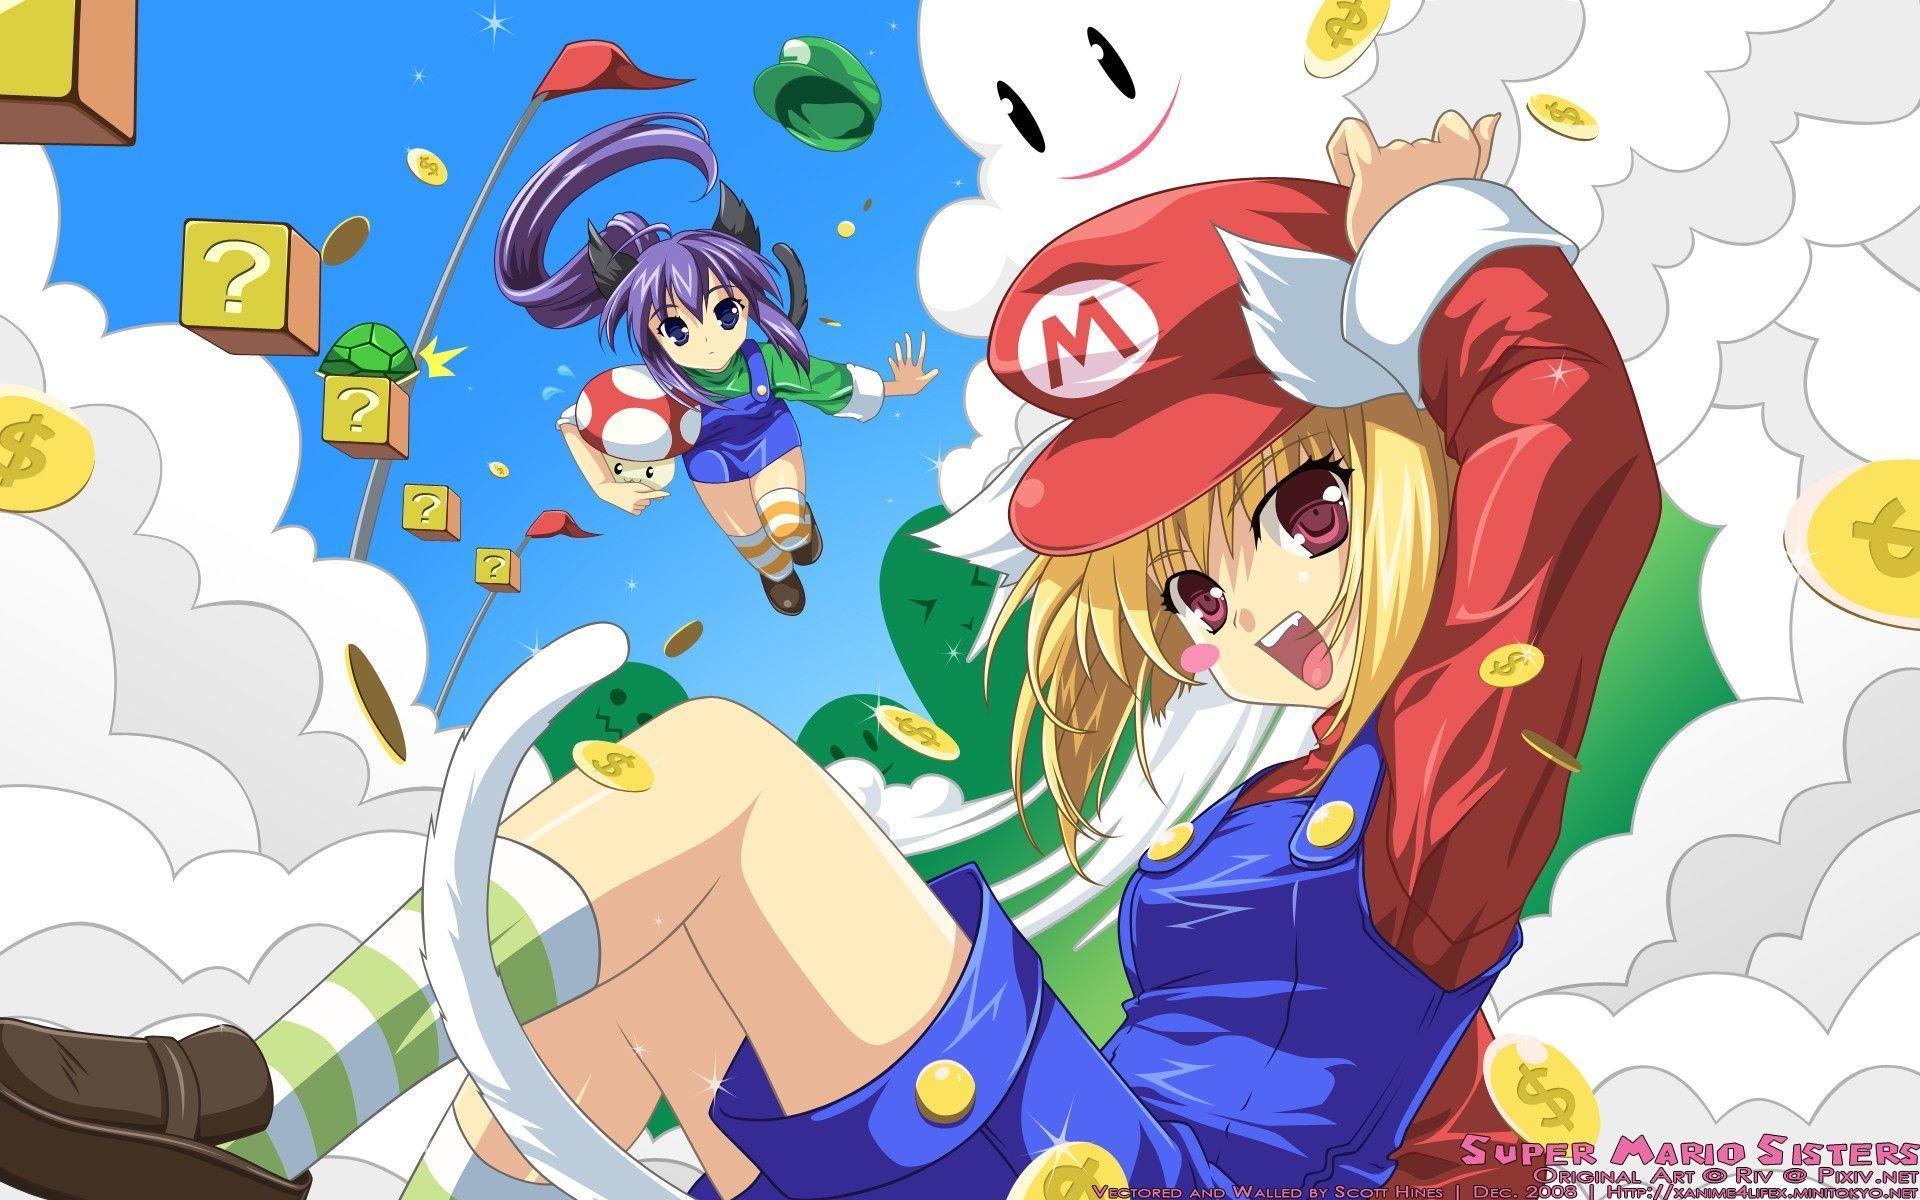 Mario Anime Wallpapers Top Free Mario Anime Backgrounds Wallpaperaccess